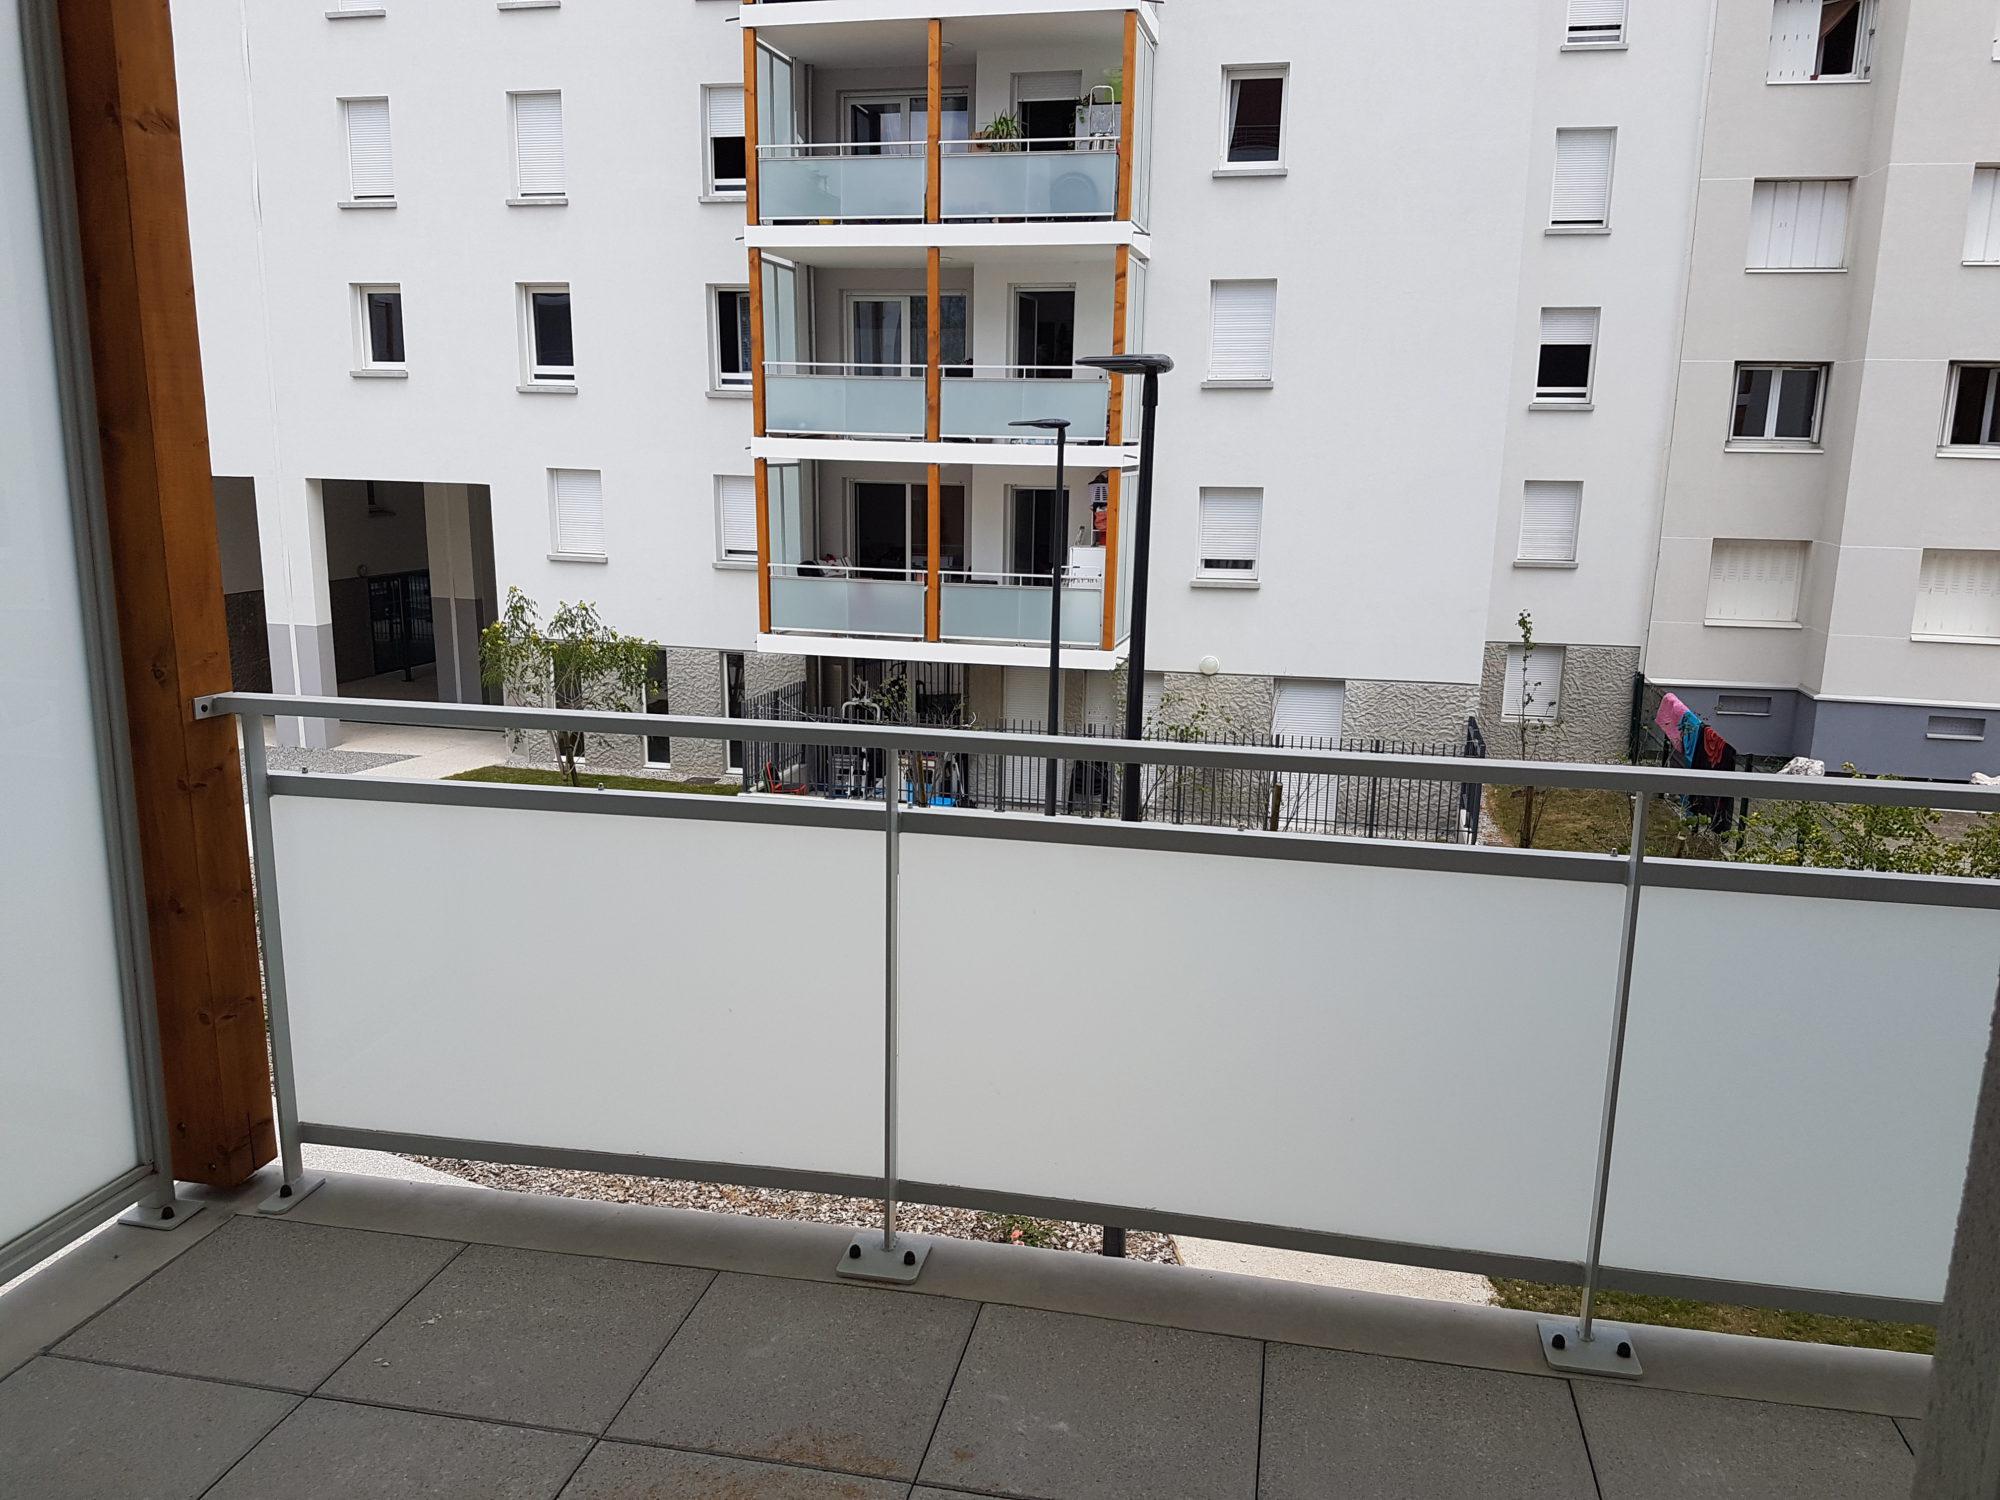 Colocation flatsharing/shared apartment Wohngemeinschaft Grenoble ?